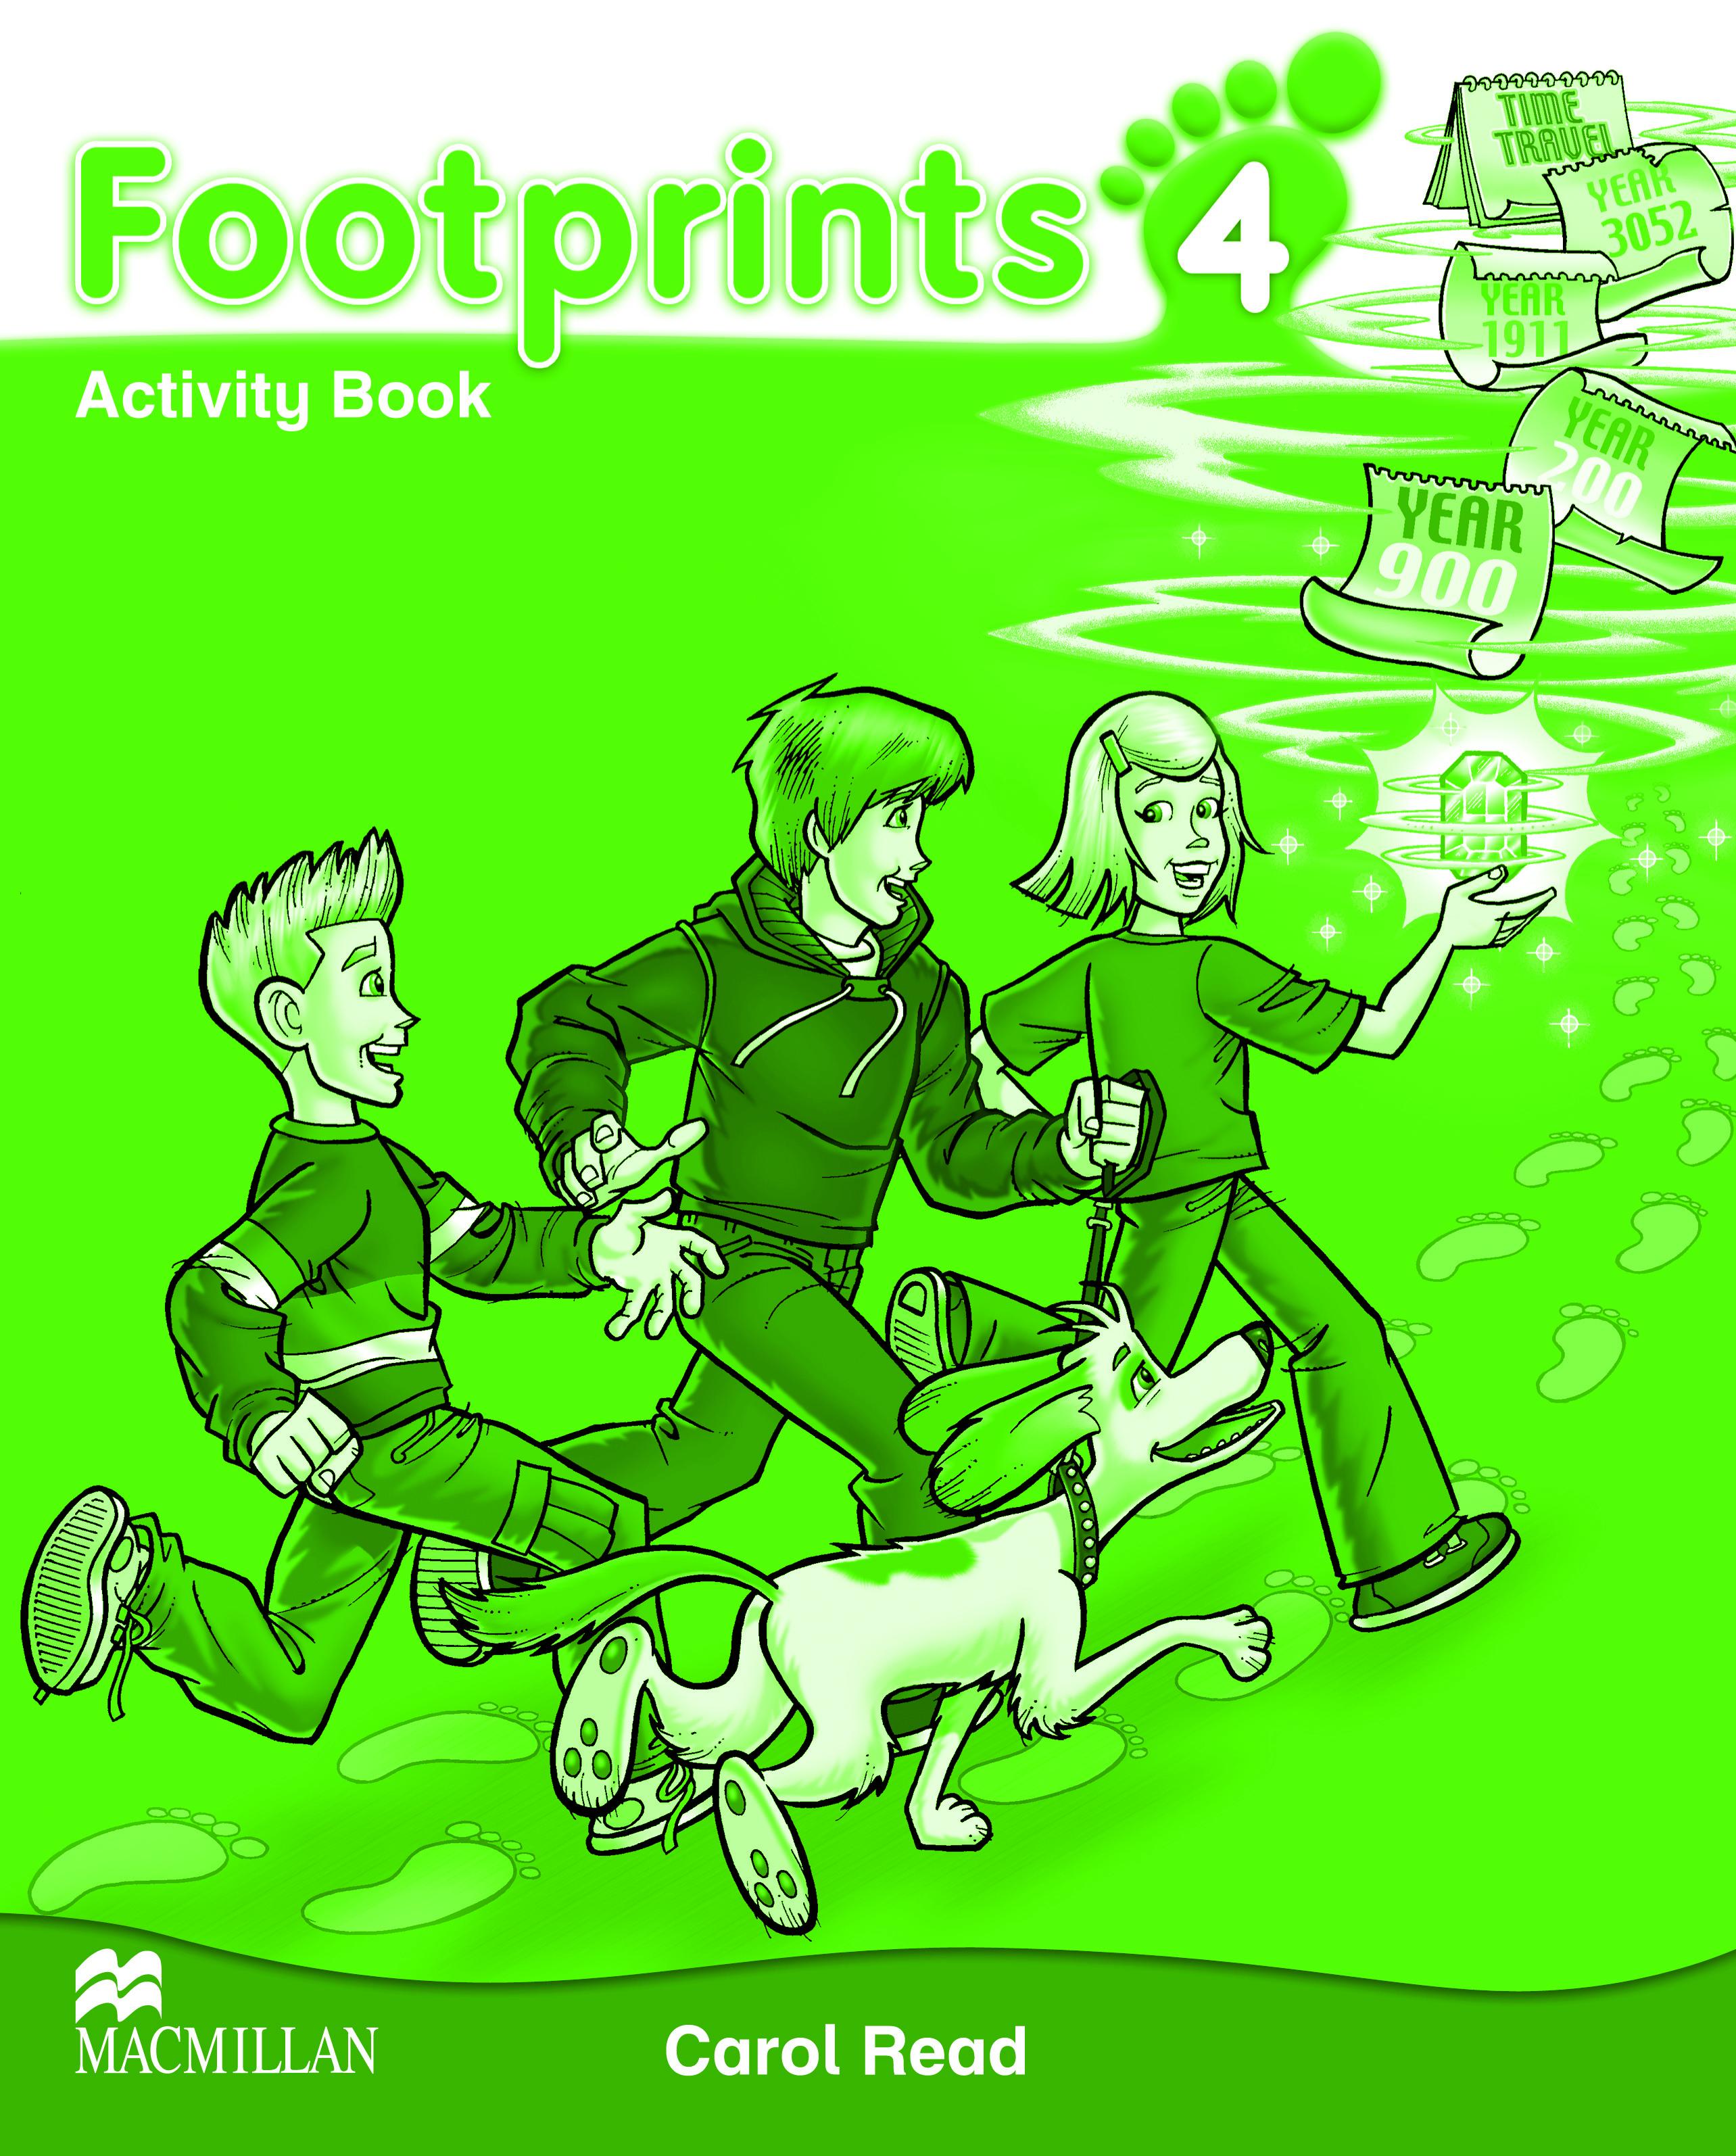 Footprints 4 Activity Book